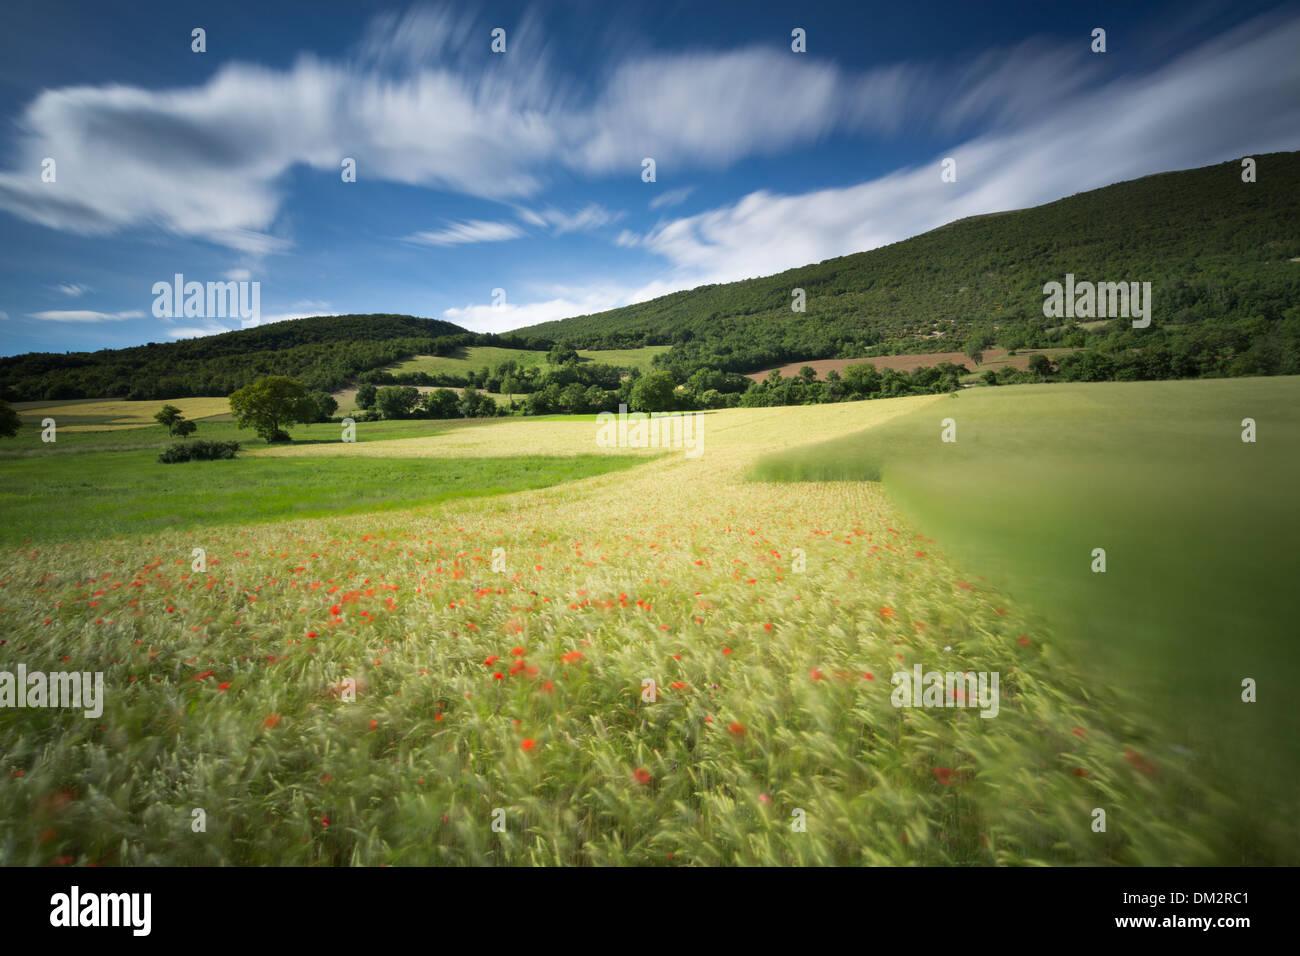 Klatschmohn im Gerstenfeld in der Nähe von Campi, Umbrien, Italien Stockbild